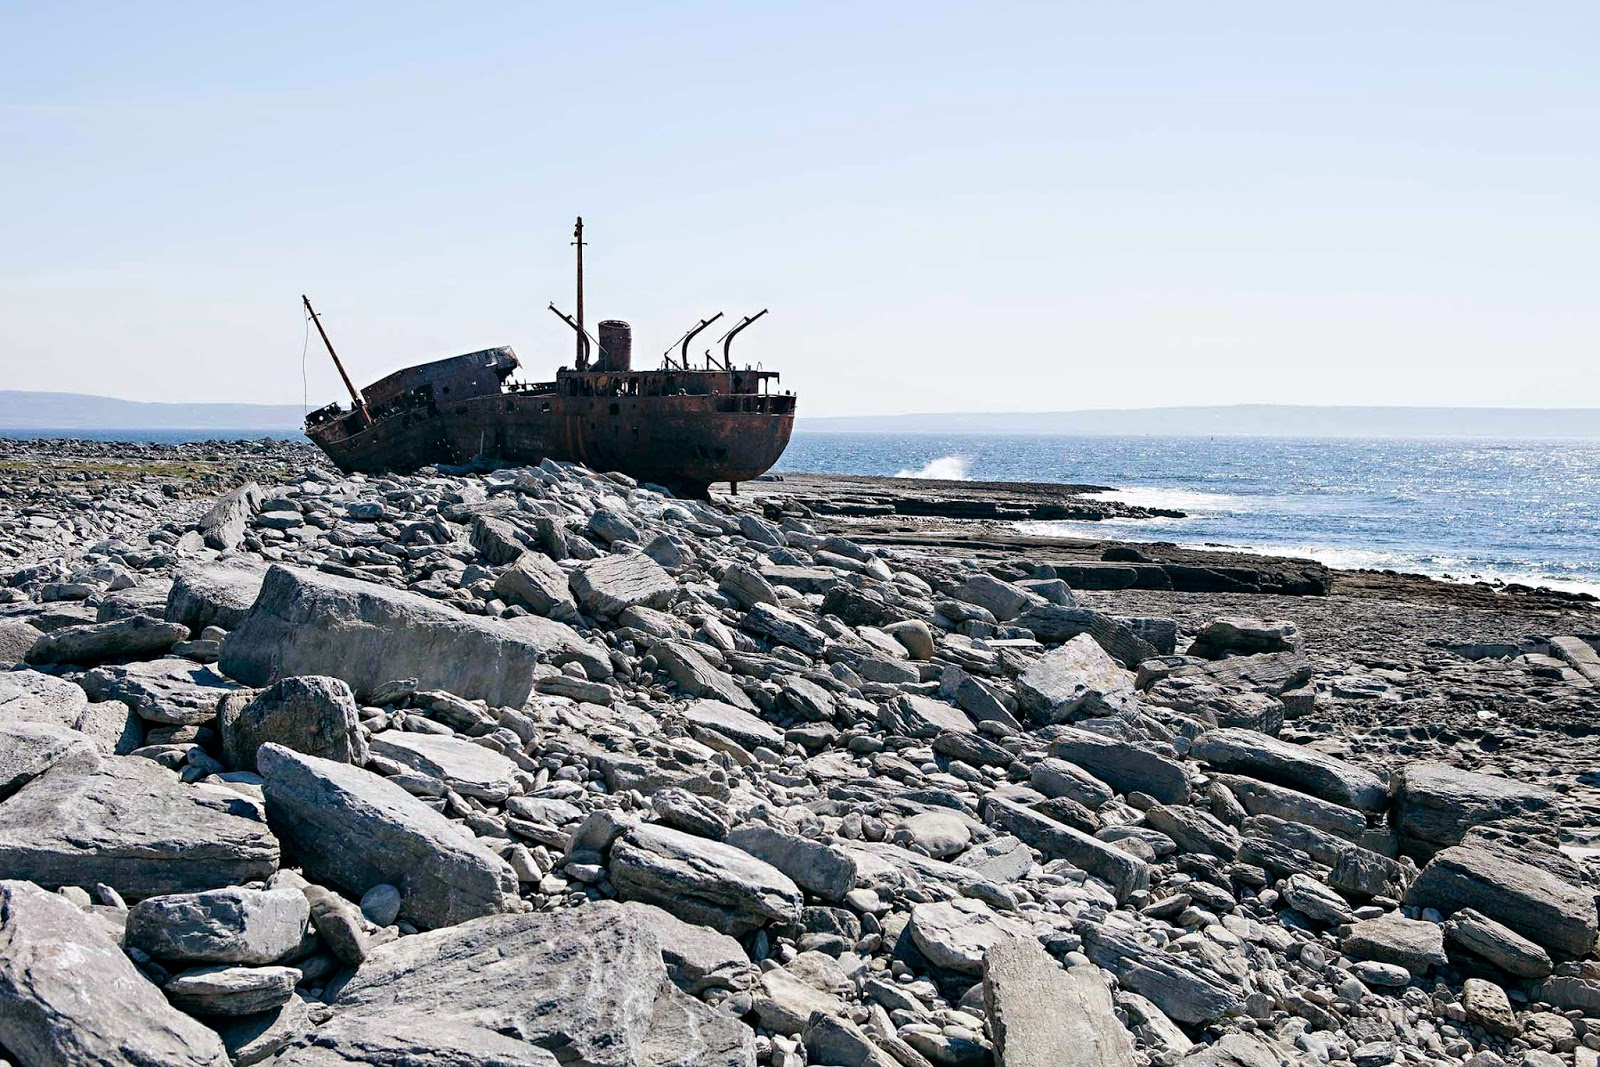 The Plassey Shipwreck